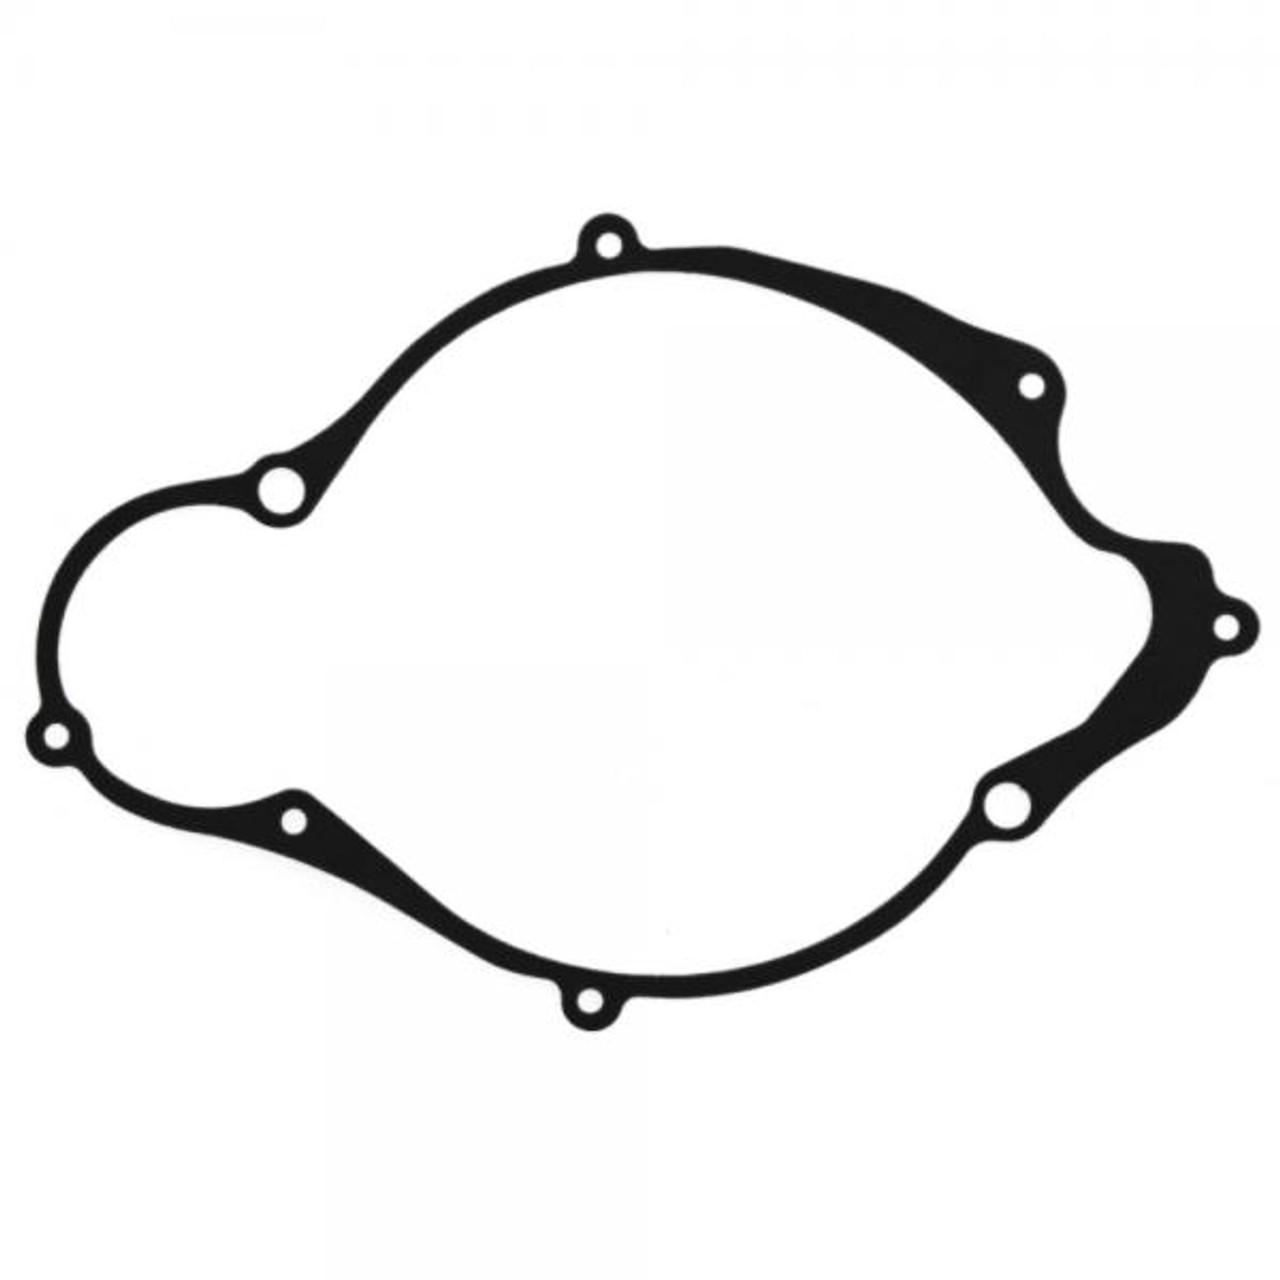 OEM Gas Gas clutch cover gasket metal 1.2mm